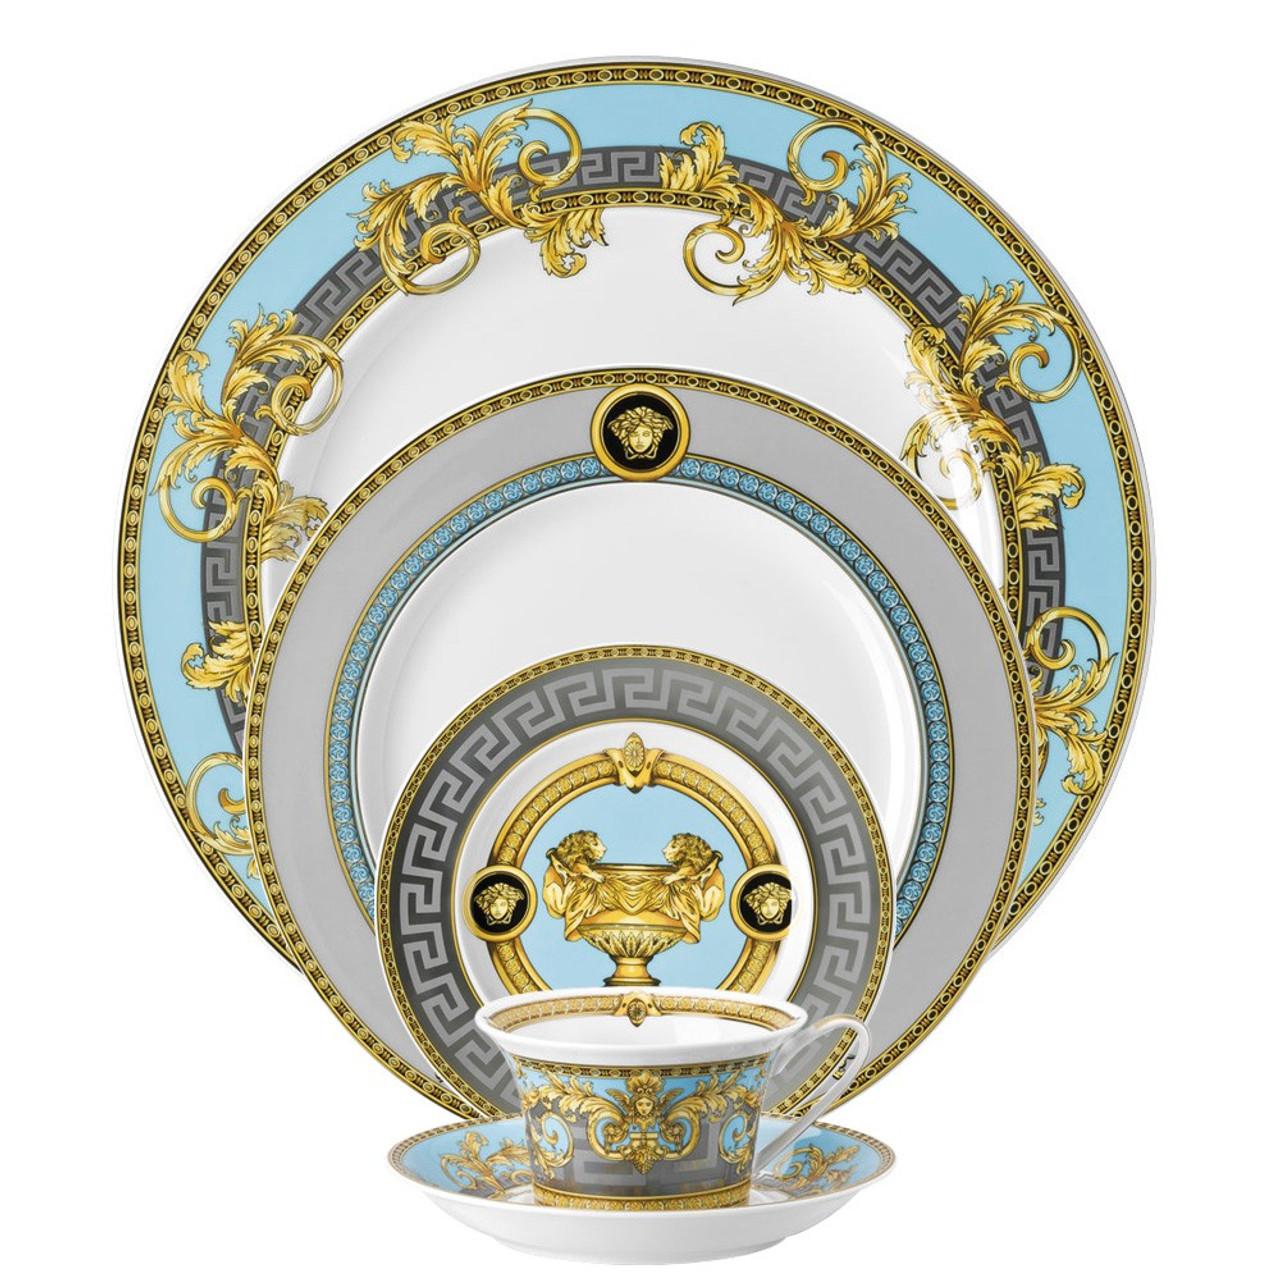 81837f1ba764 5 piece Dinnerware Set   Prestige Gala Le Bleu   Rosenthal Shop